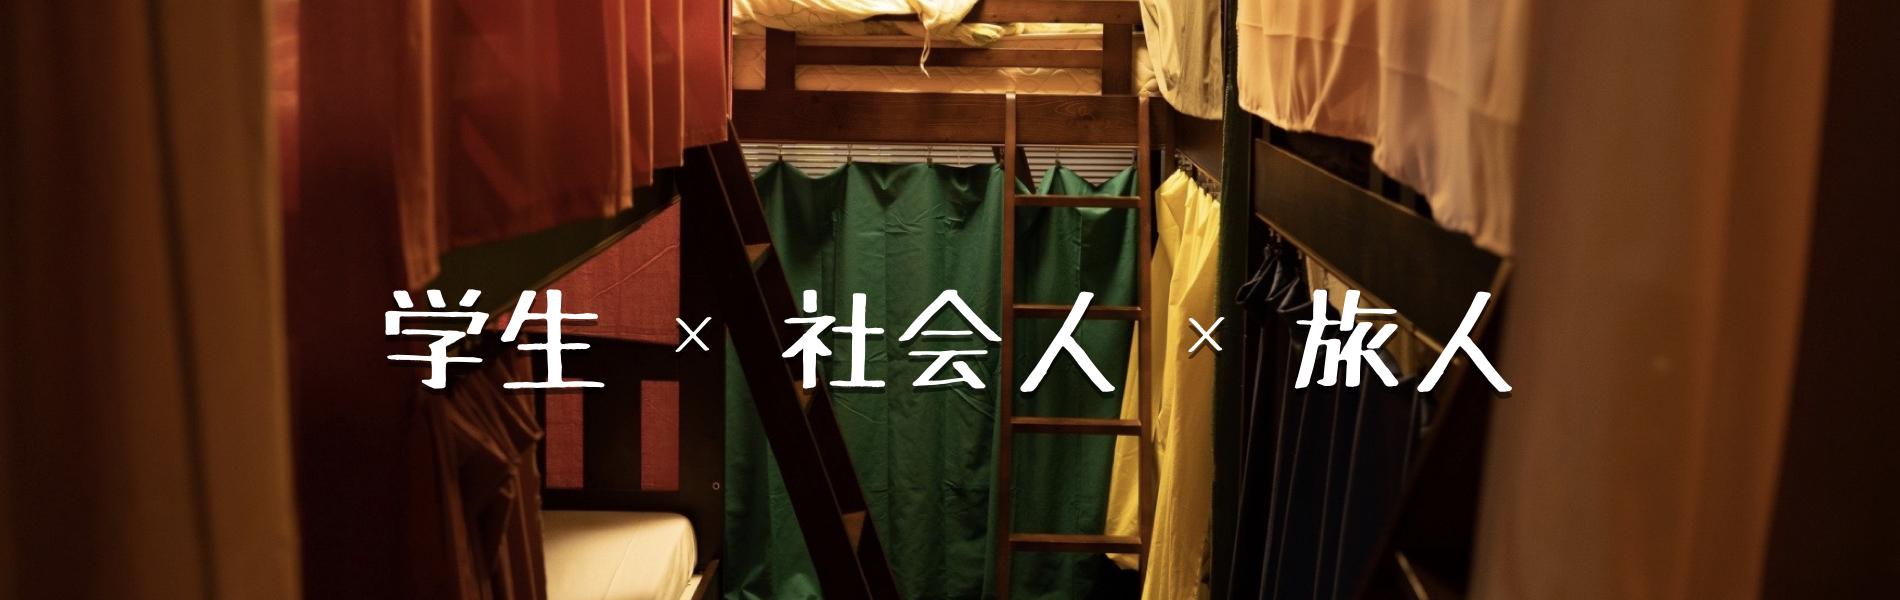 https://yosuga.labore.jp//